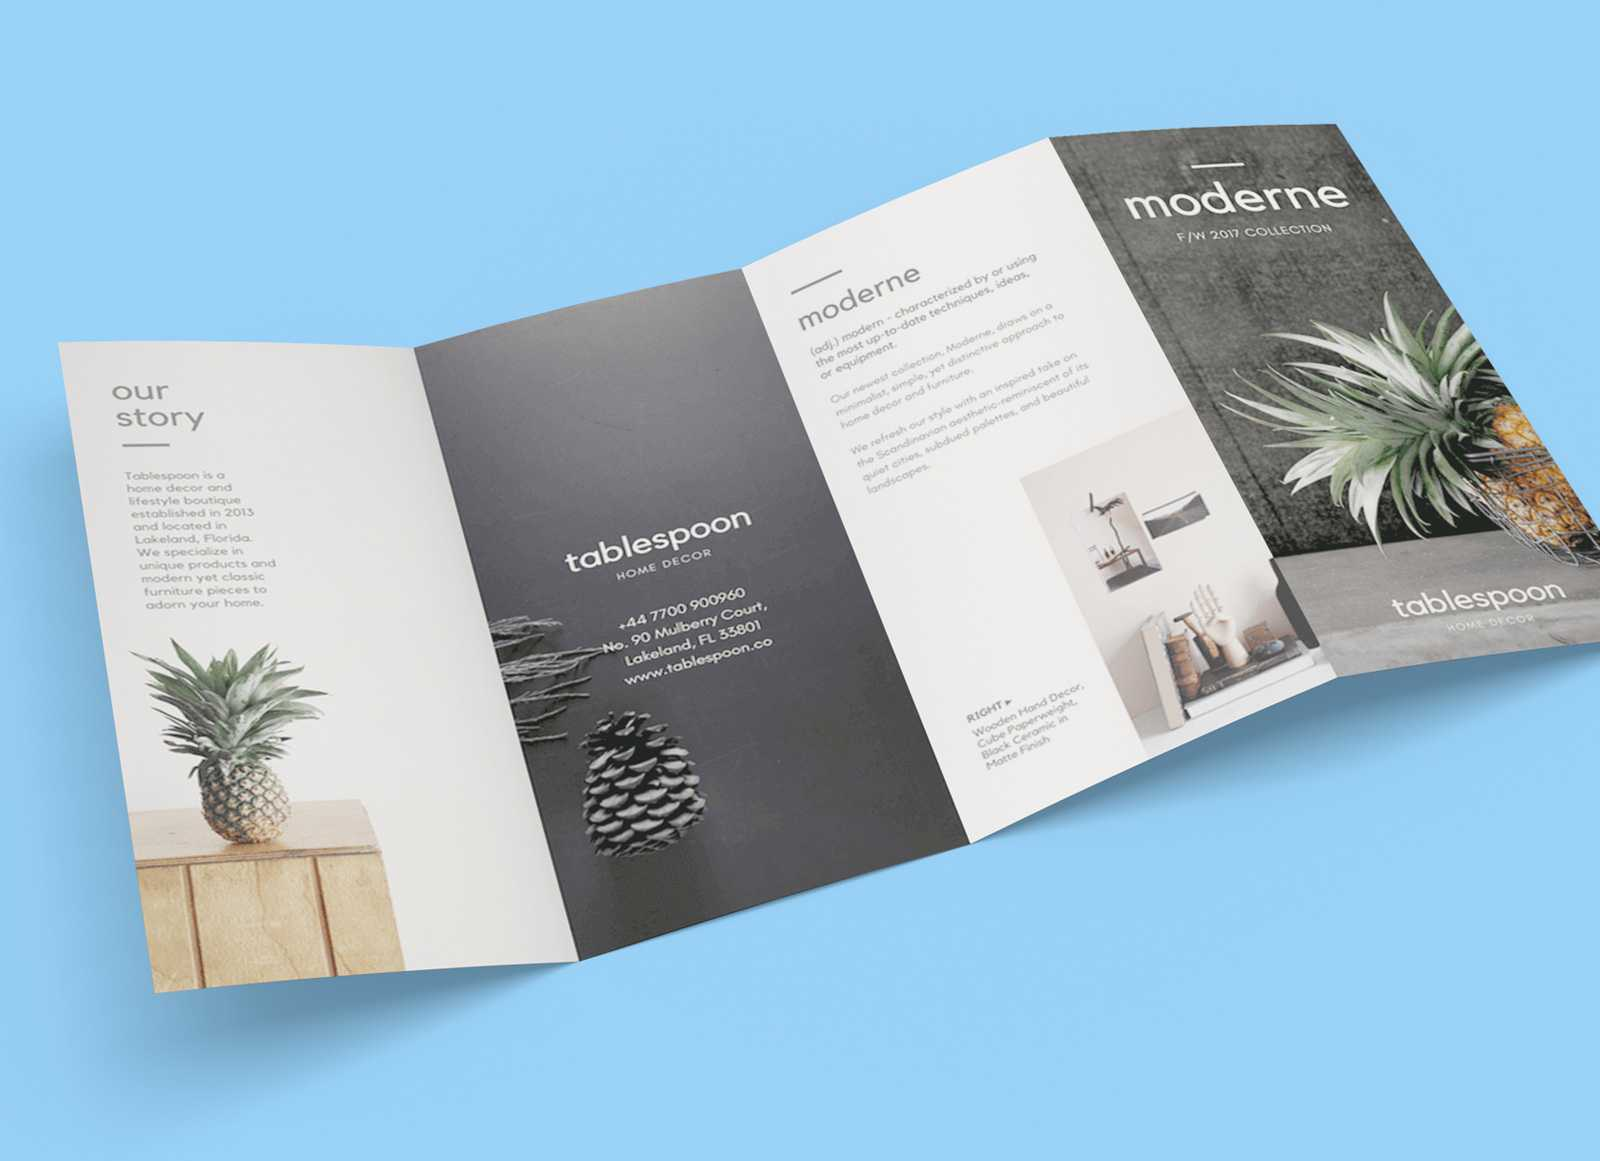 Free 4 Panel Quad Fold Brochure Mockup Psd - Good Mockups Within 4 Fold Brochure Template